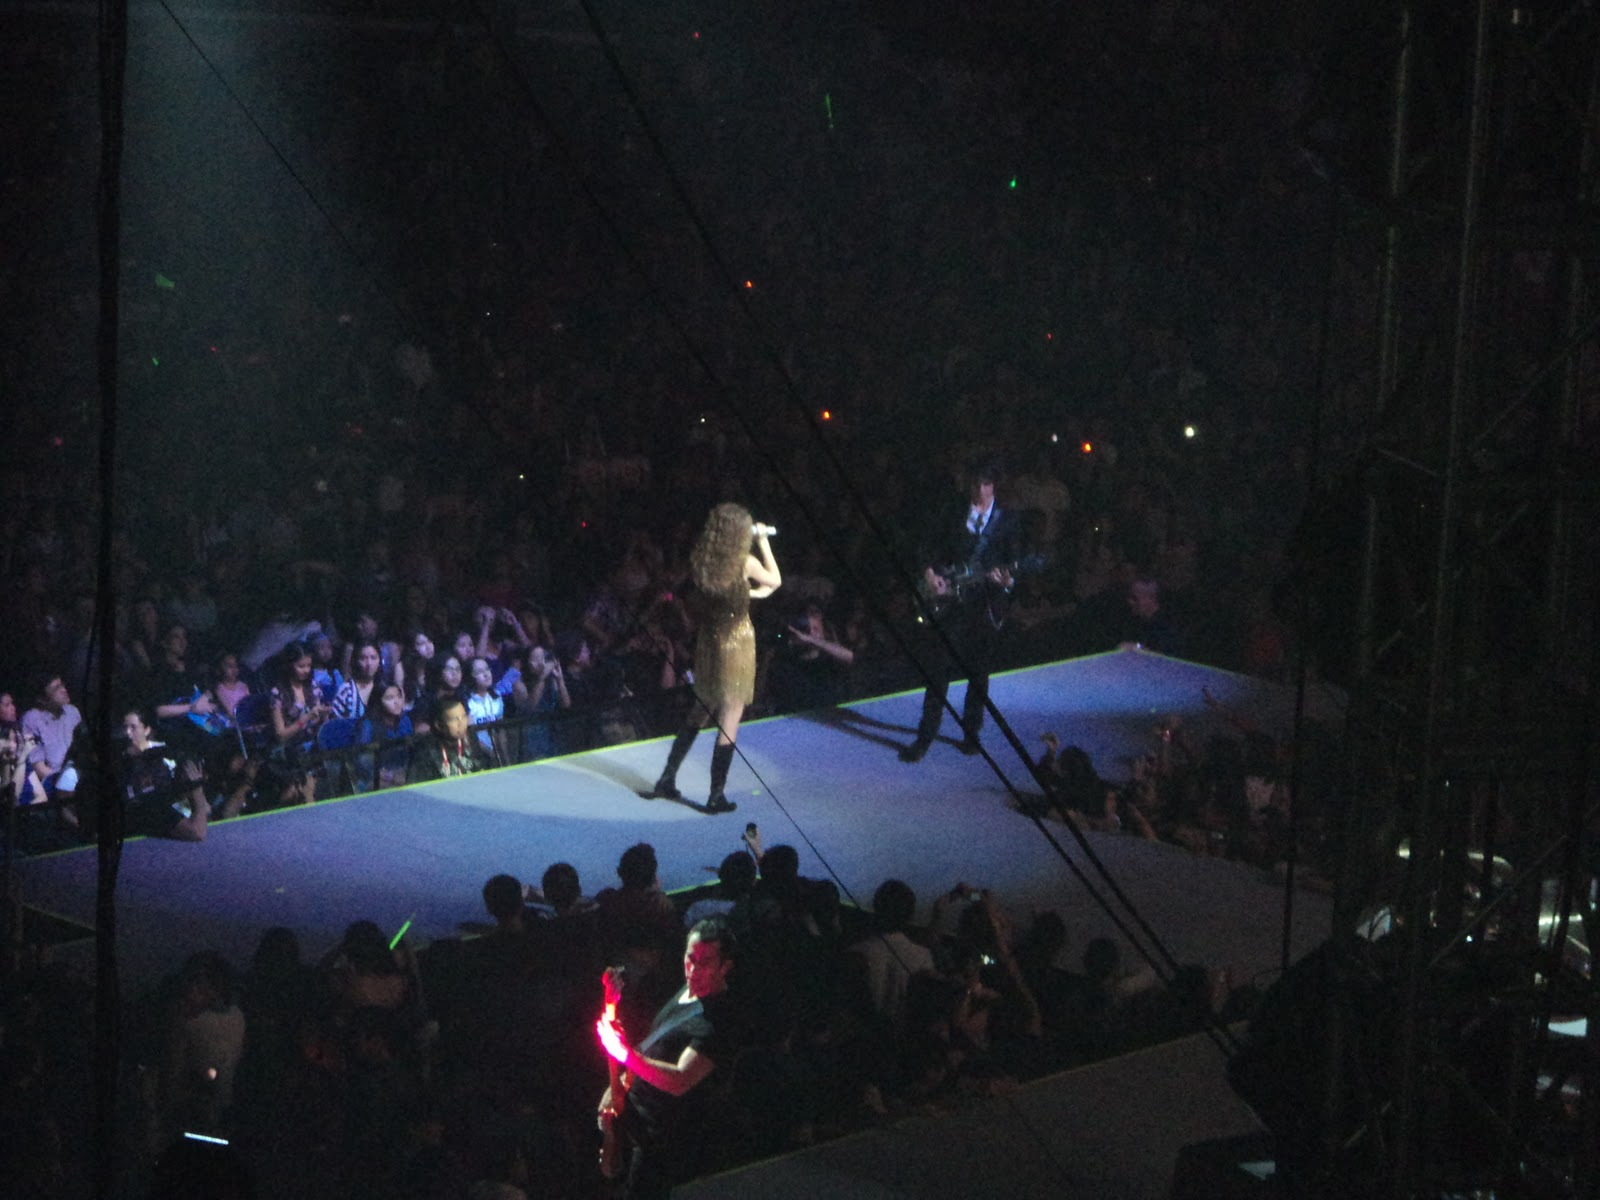 http://1.bp.blogspot.com/-BLWVJjlTaAc/TWAoaIwBDSI/AAAAAAAABjU/ykF3eccn8KM/s1600/Taylor+Swift+Concert+Feb+19+2011+034.JPG